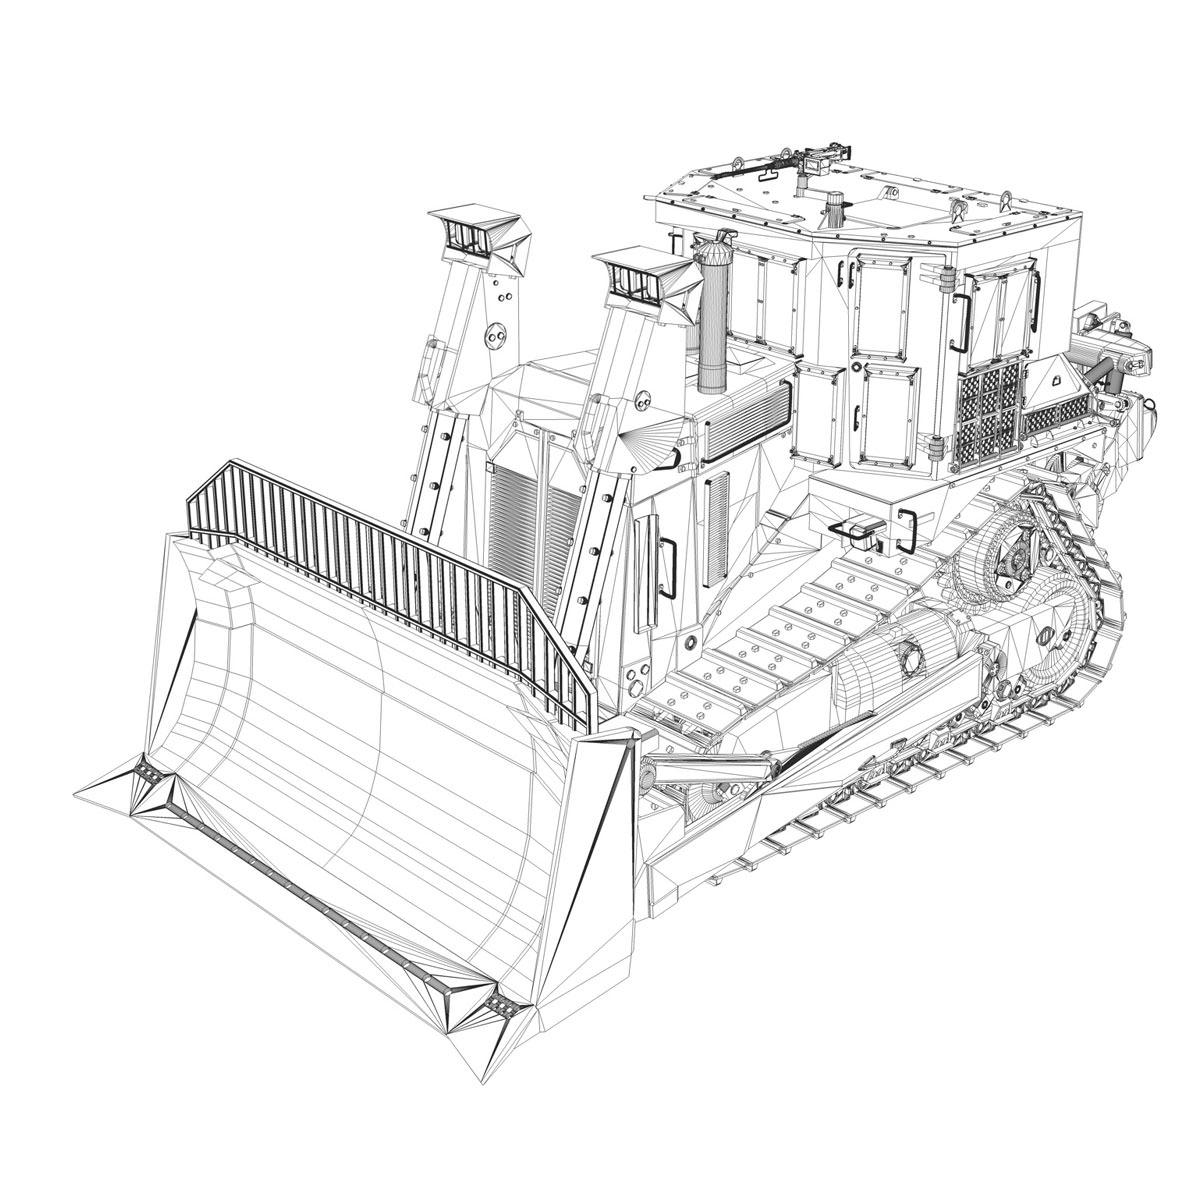 Armored Cat D9r Bulldozer 3d Model Obj 3ds Fbx C4d